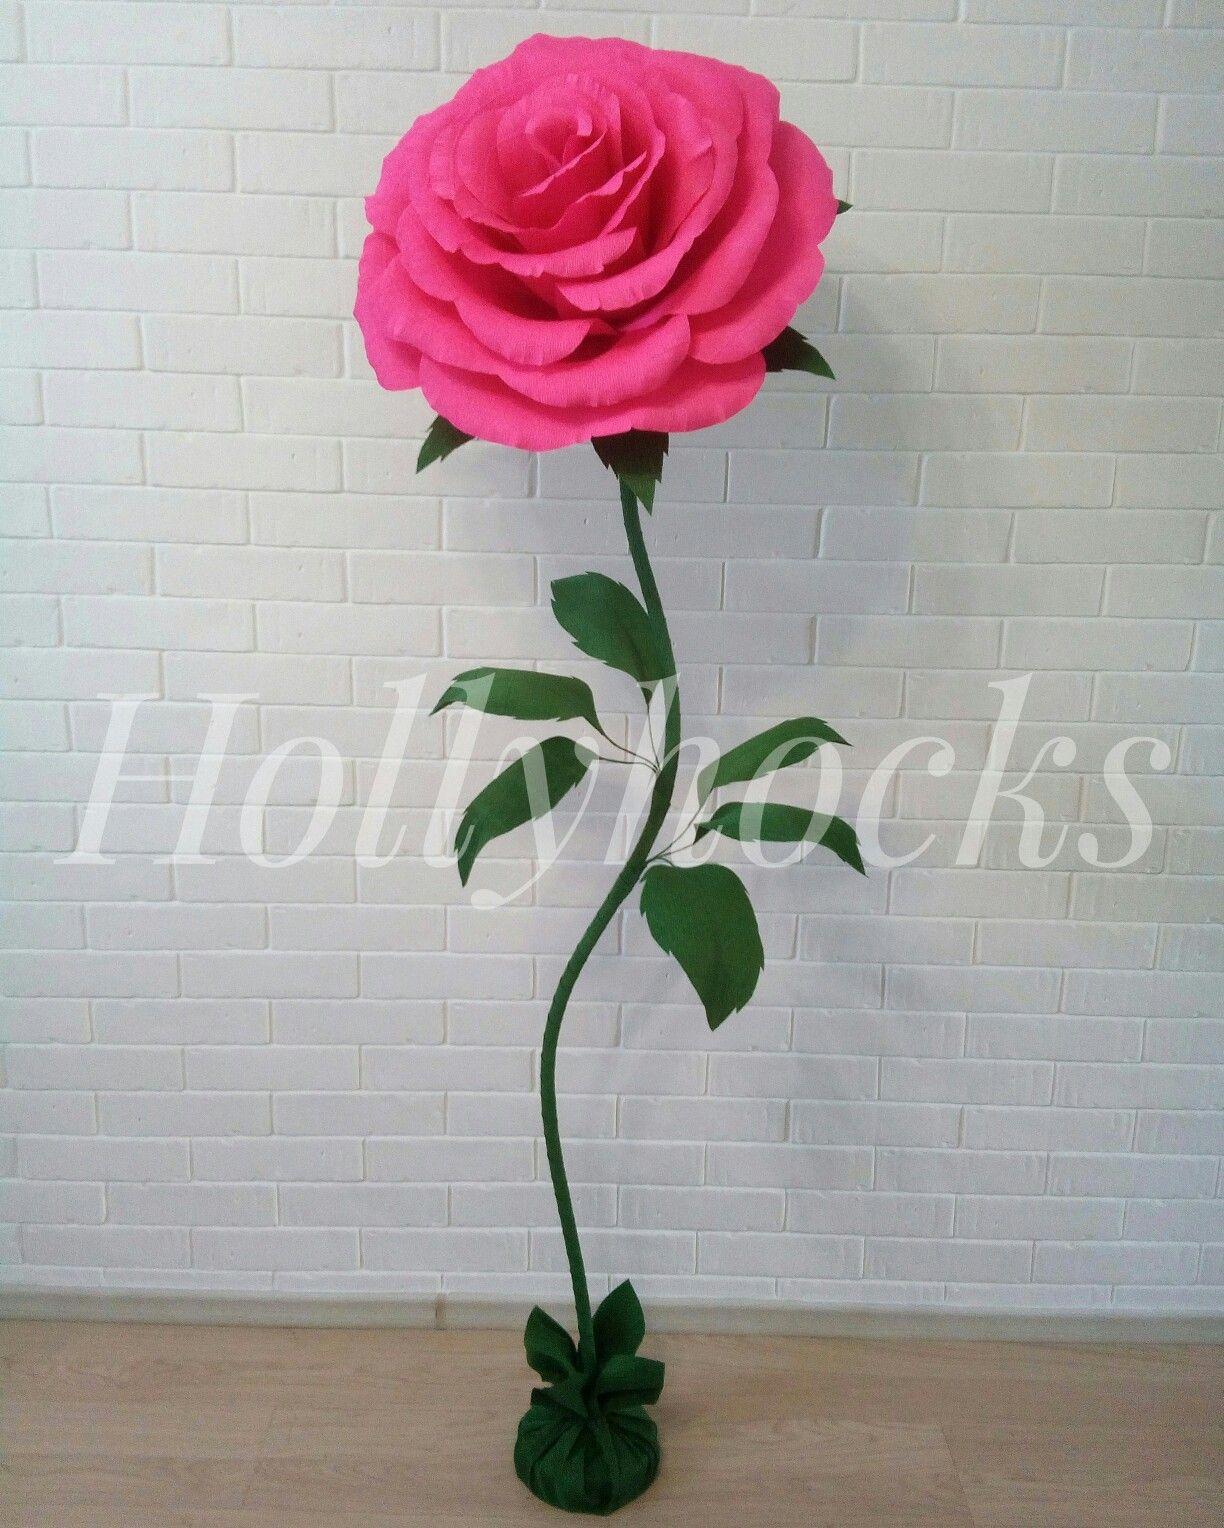 Pin De Gorobec Liliya Em Rostovye Cvety Flores Gigantes Arranjos